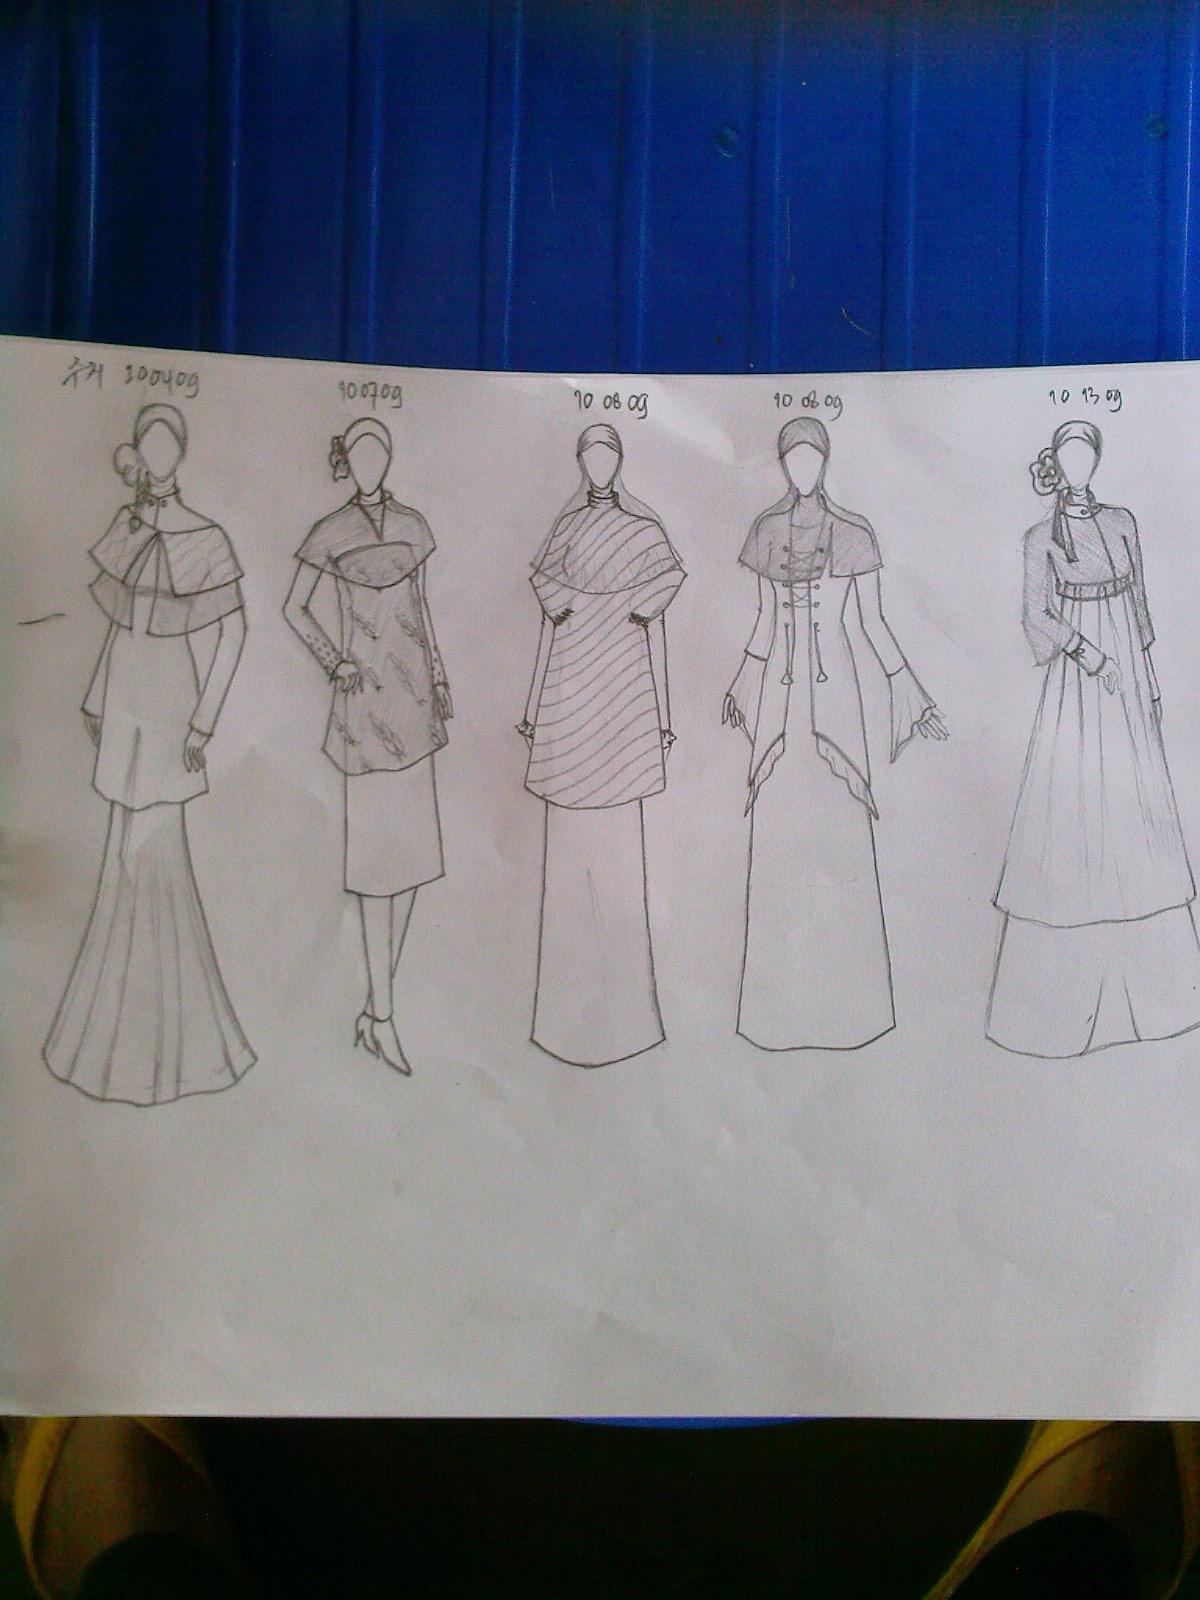 hijab-pashminaa: Design Baju Muslim Images